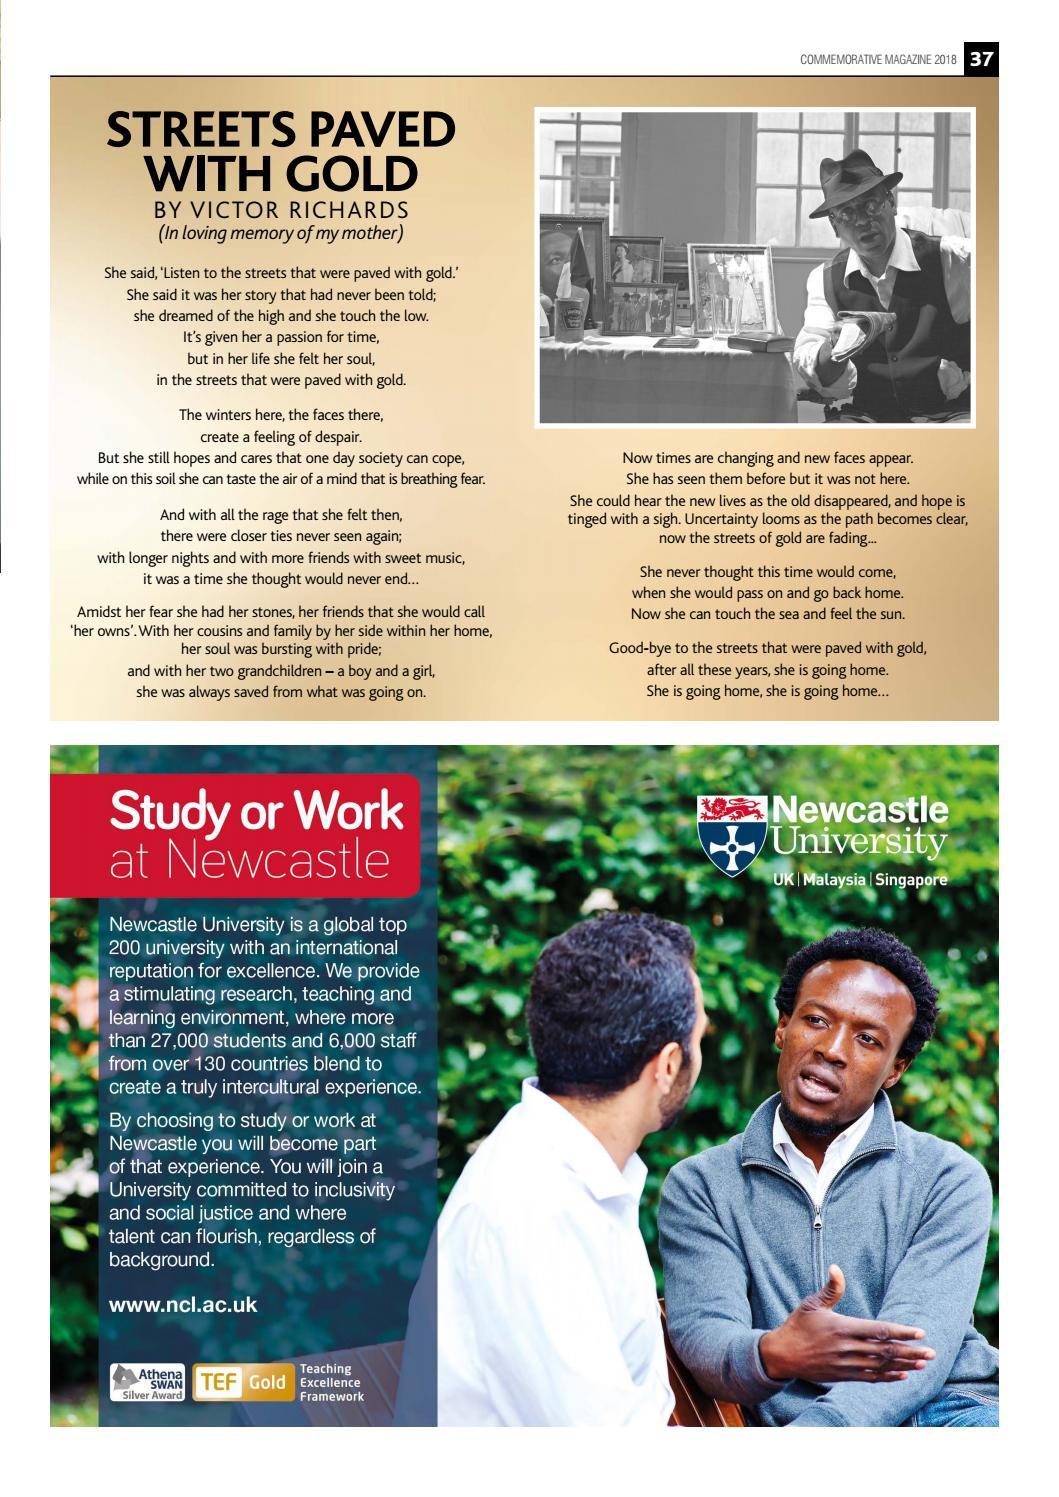 Windrush Commemorative magazine 2018 by Sugar Media and Marketing